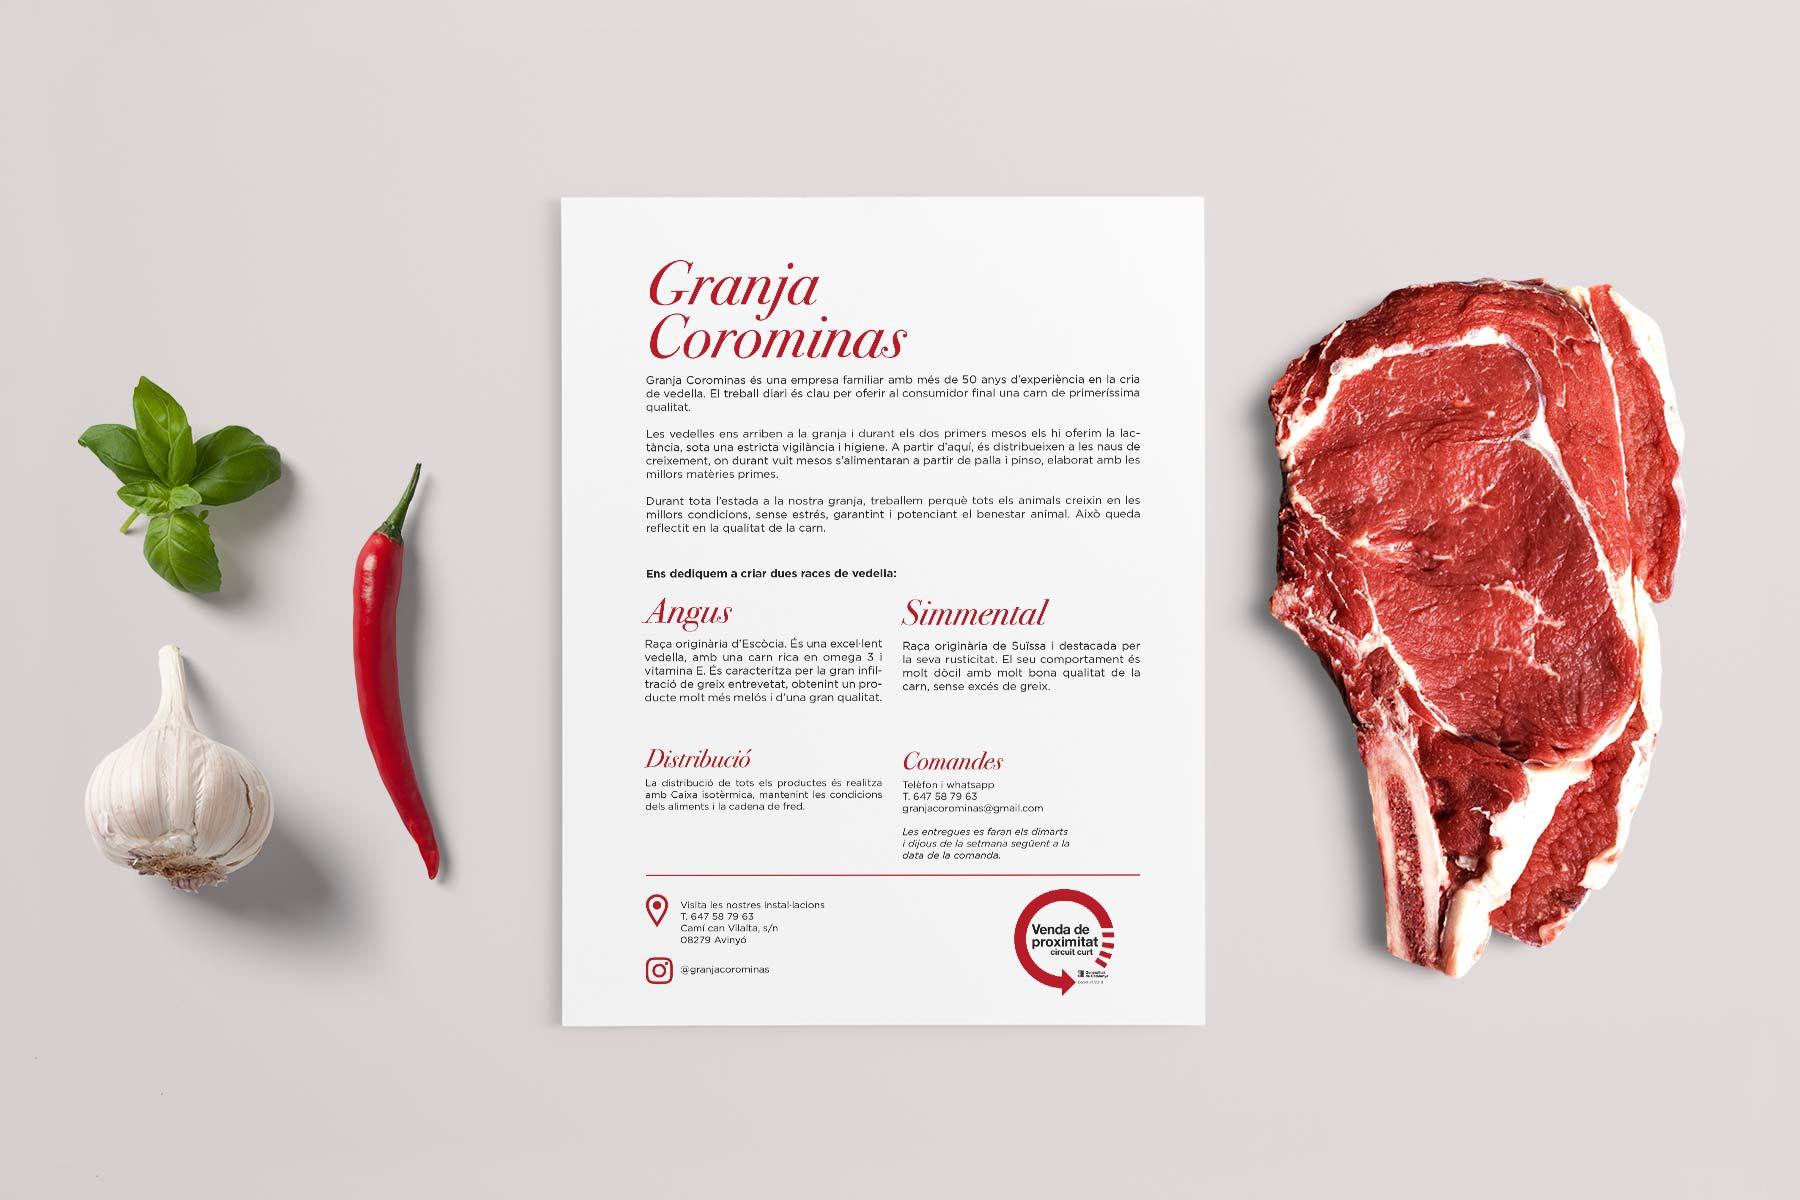 Granja-Corominas-Disseny-Grafic-Marca-03